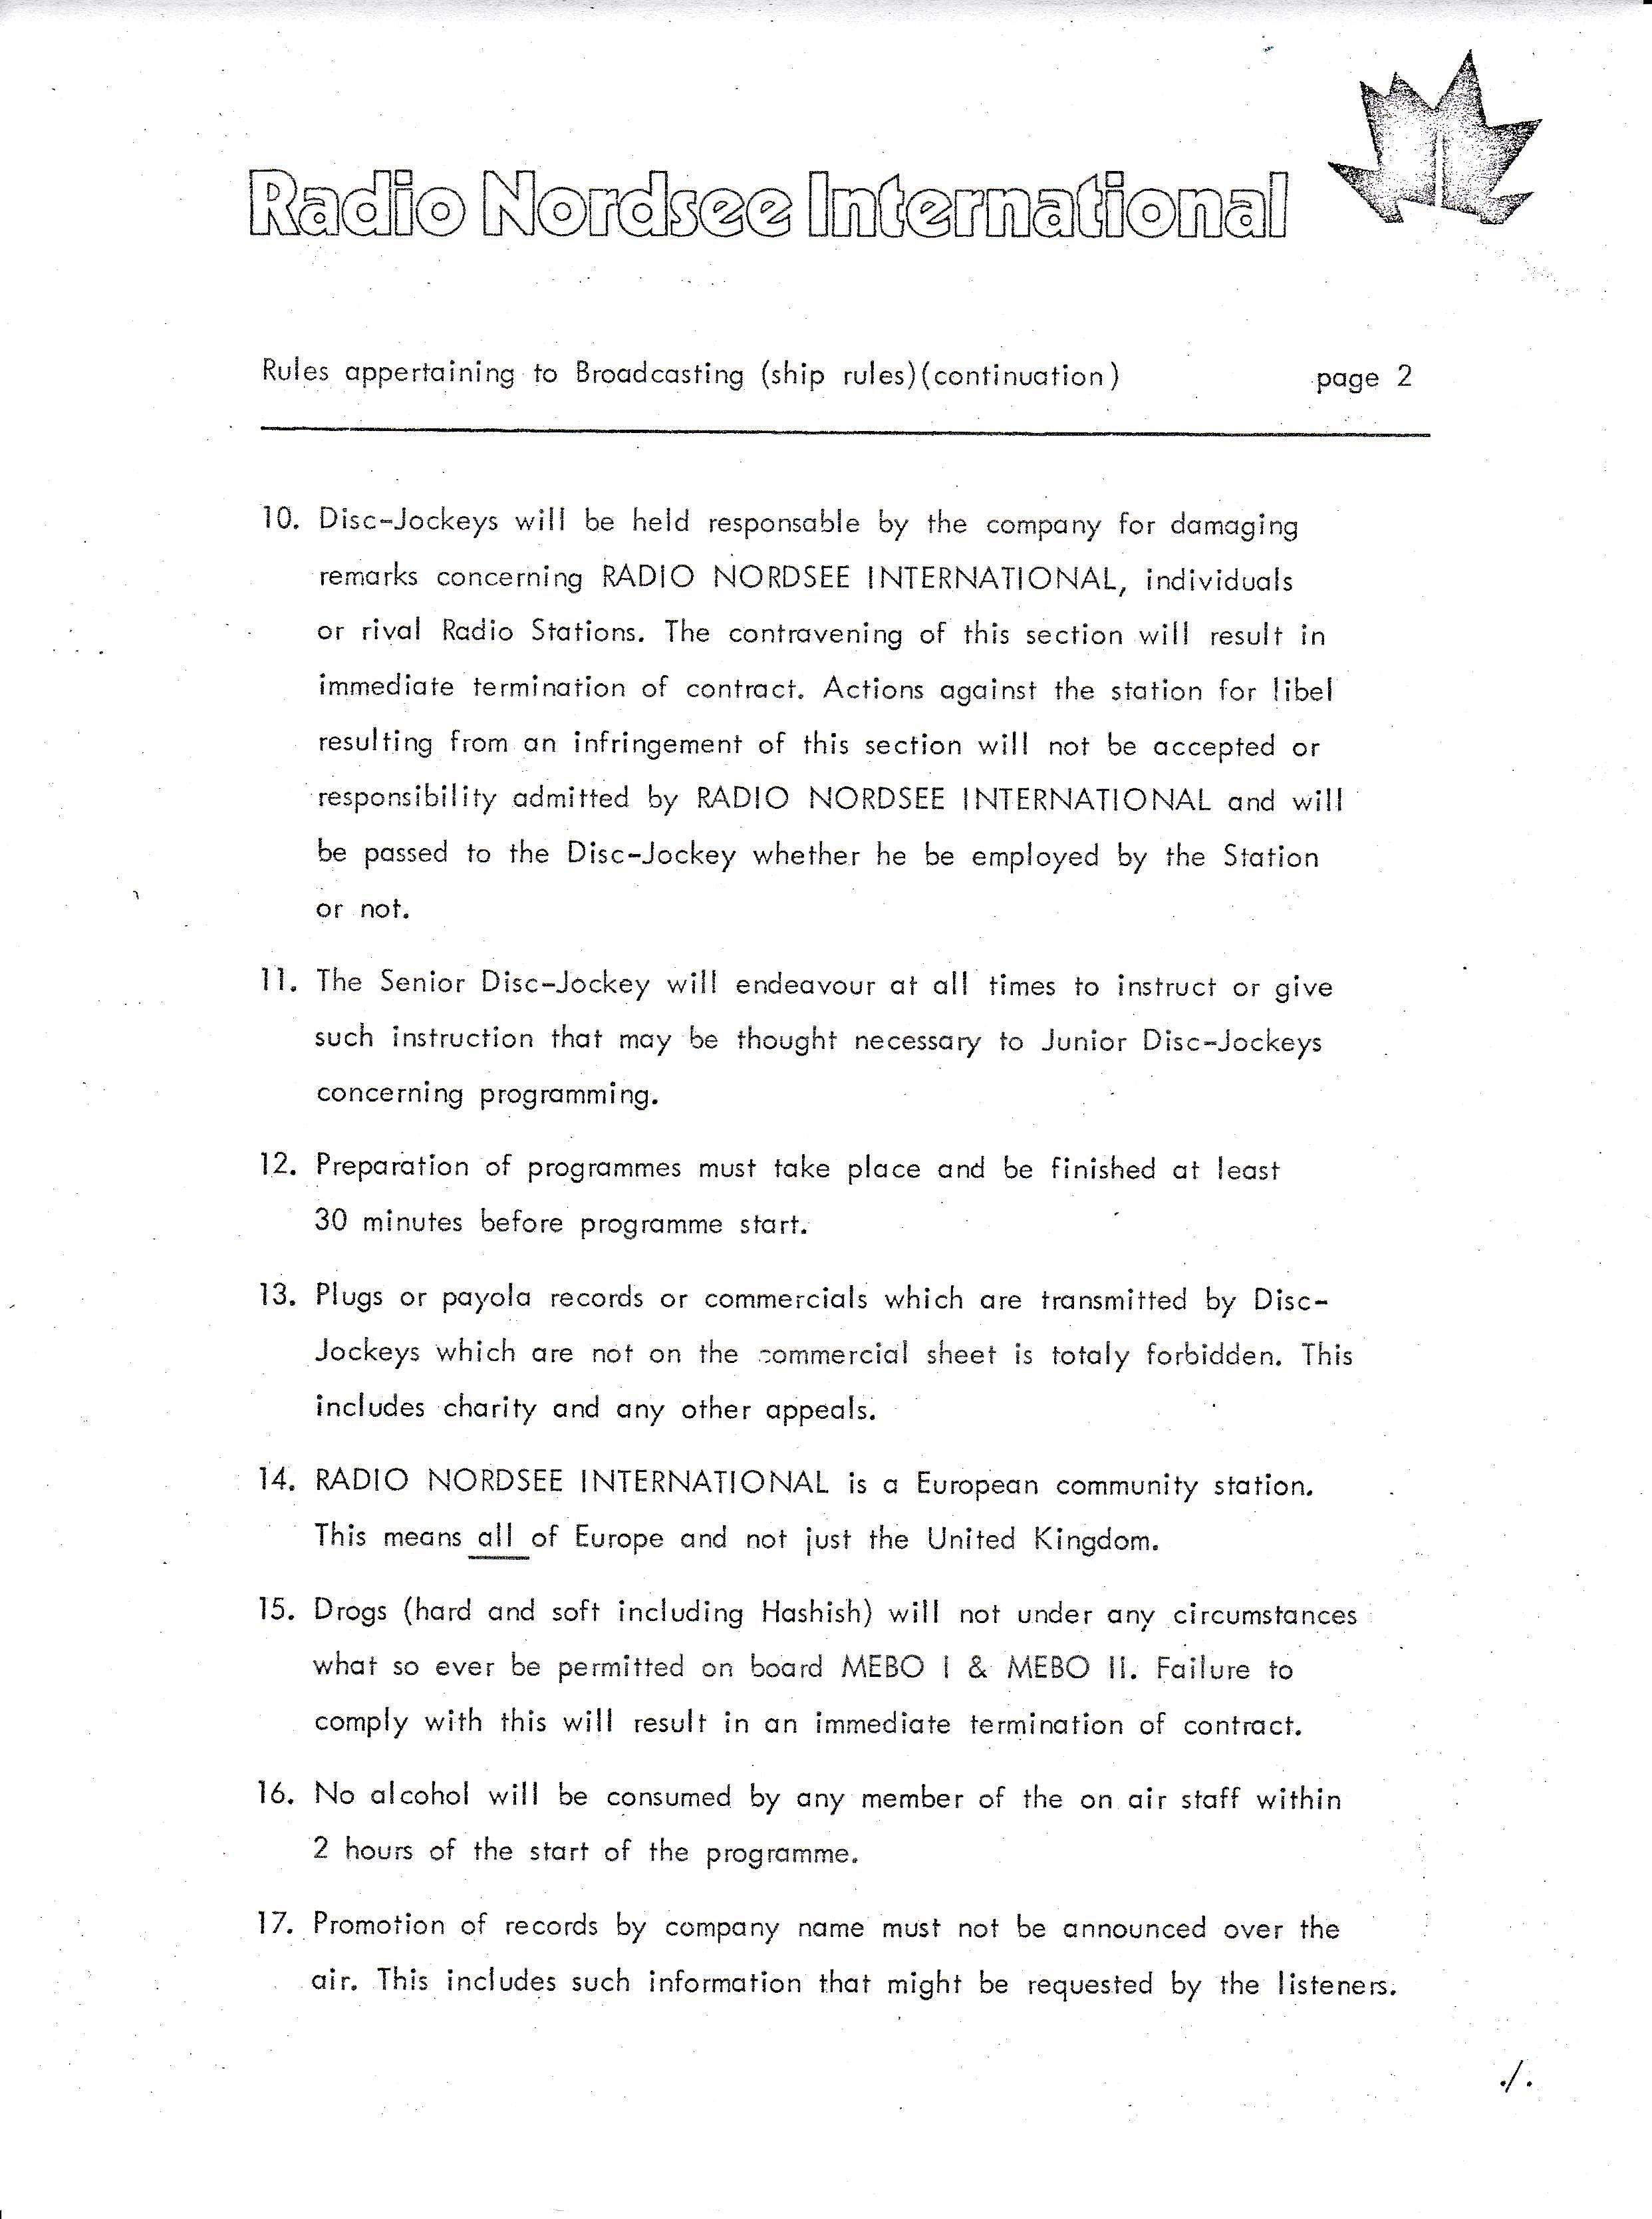 RNI Rules P2-2